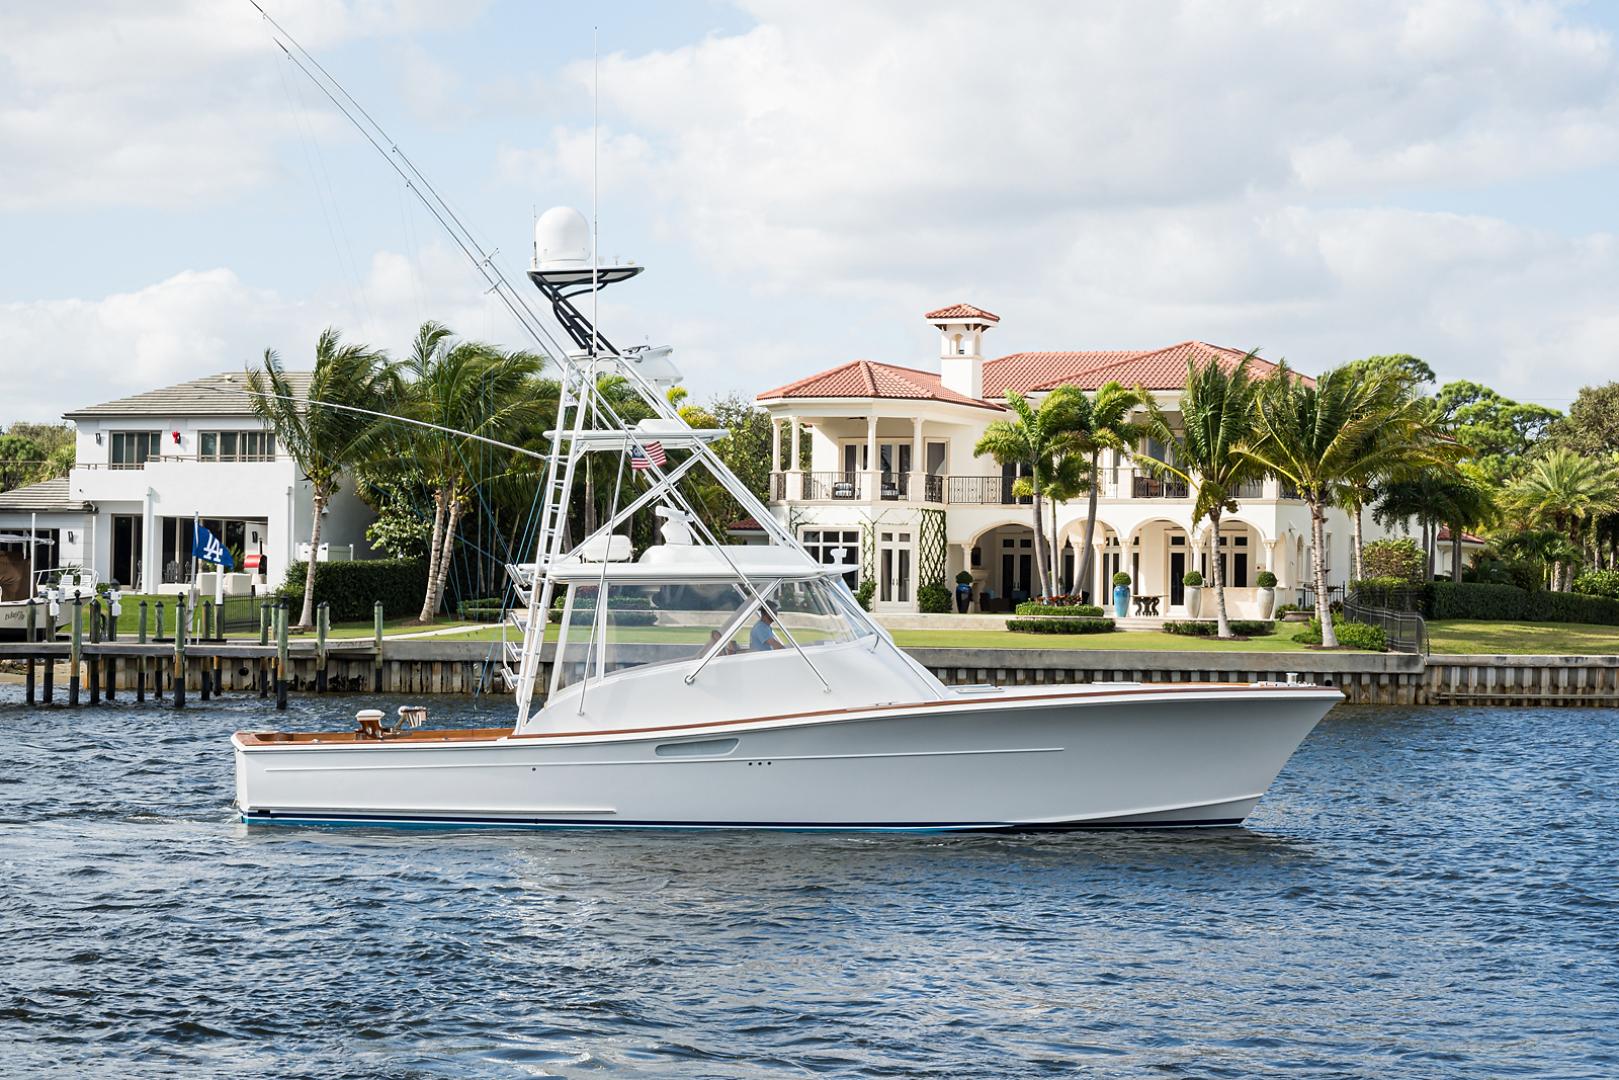 Release-One-of-A-Kind Custom Express 2014-Gladiator Jupiter-Florida-United States-Gladiator-1370143   Thumbnail